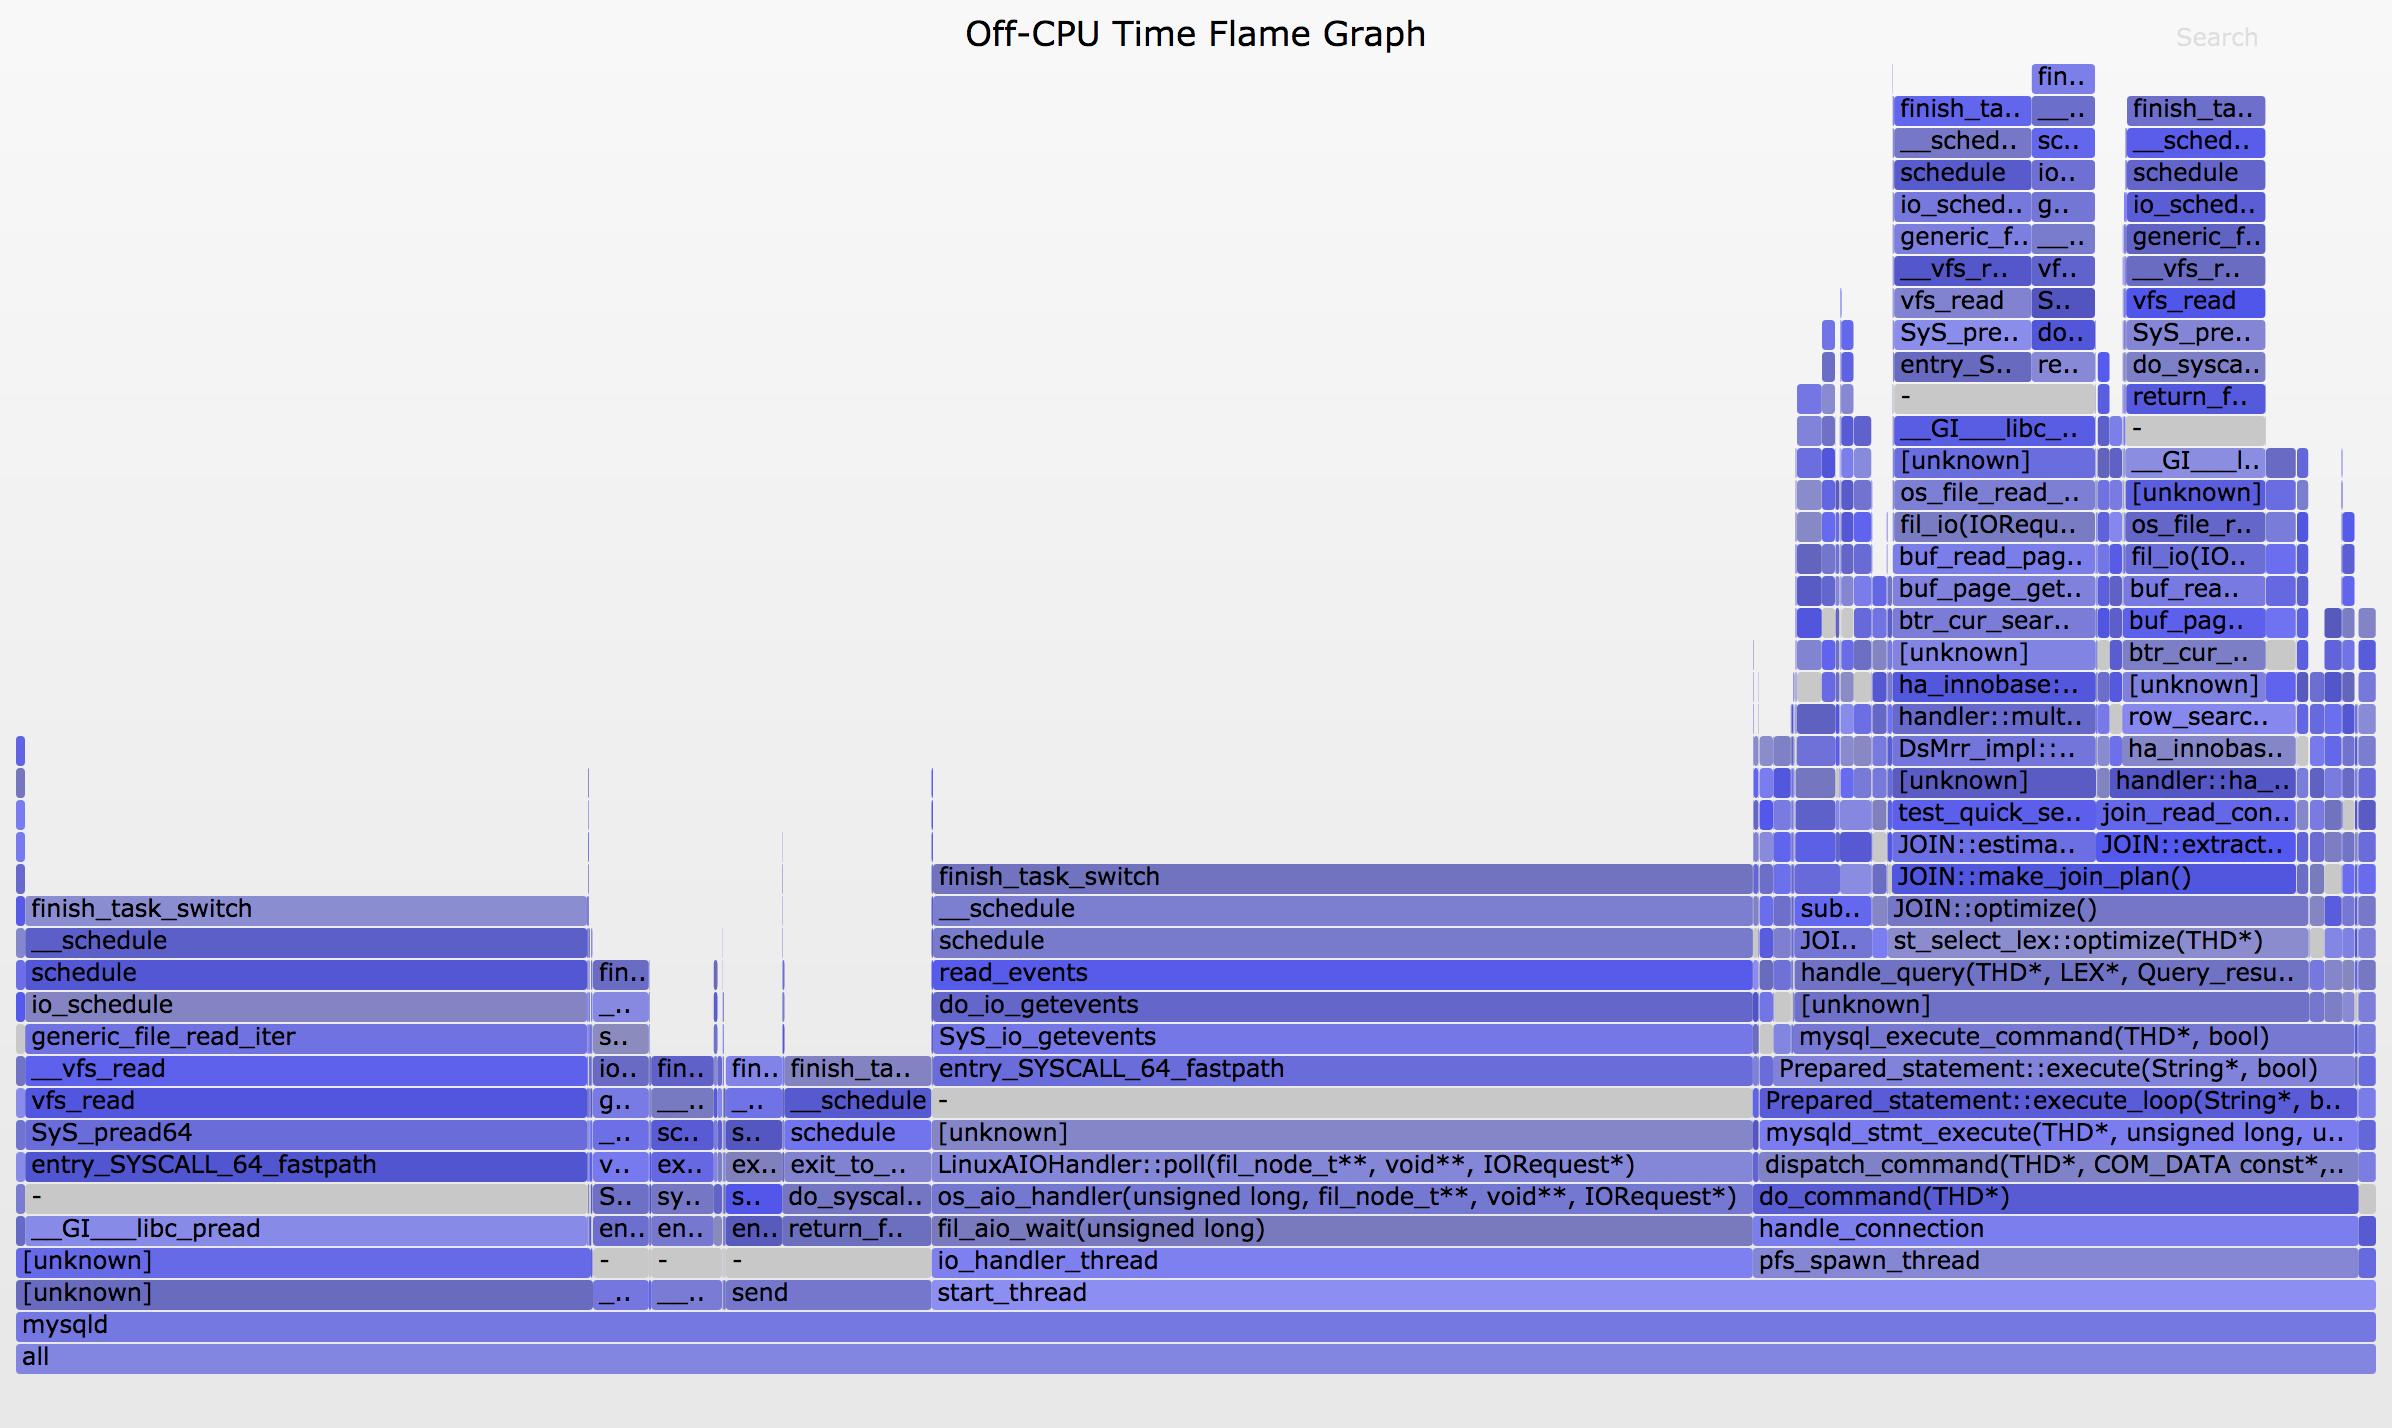 Off-CPU Analysis